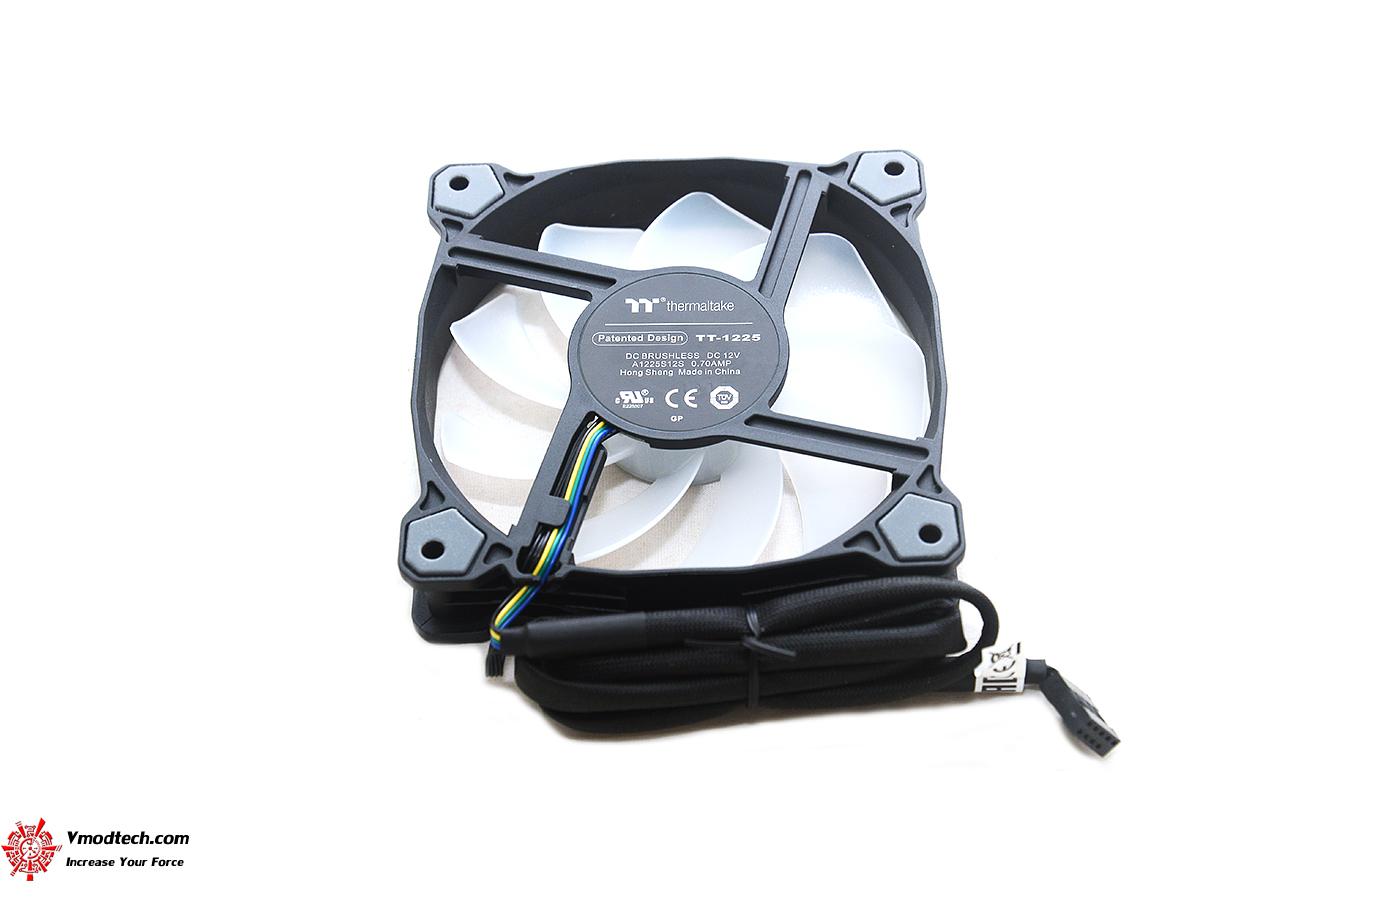 dsc 8822 Thermaltake Pure Plus 12 LED RGB Radiator Fan TT Premium Edition (3 Fan Pack) Review